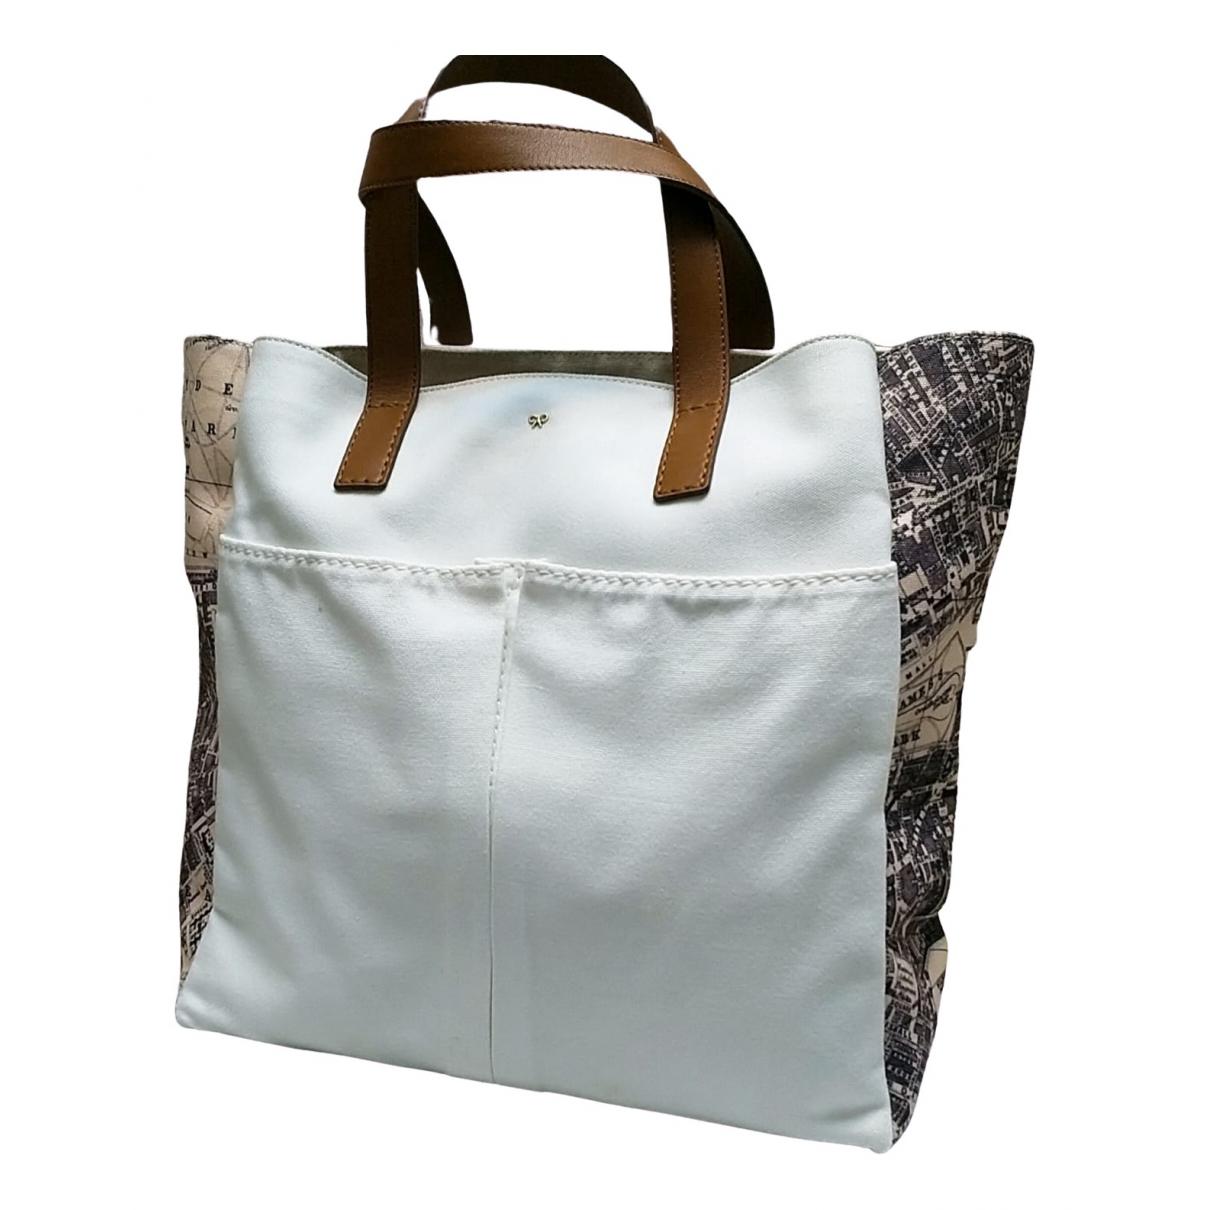 Anya Hindmarch \N Multicolour Cloth handbag for Women \N